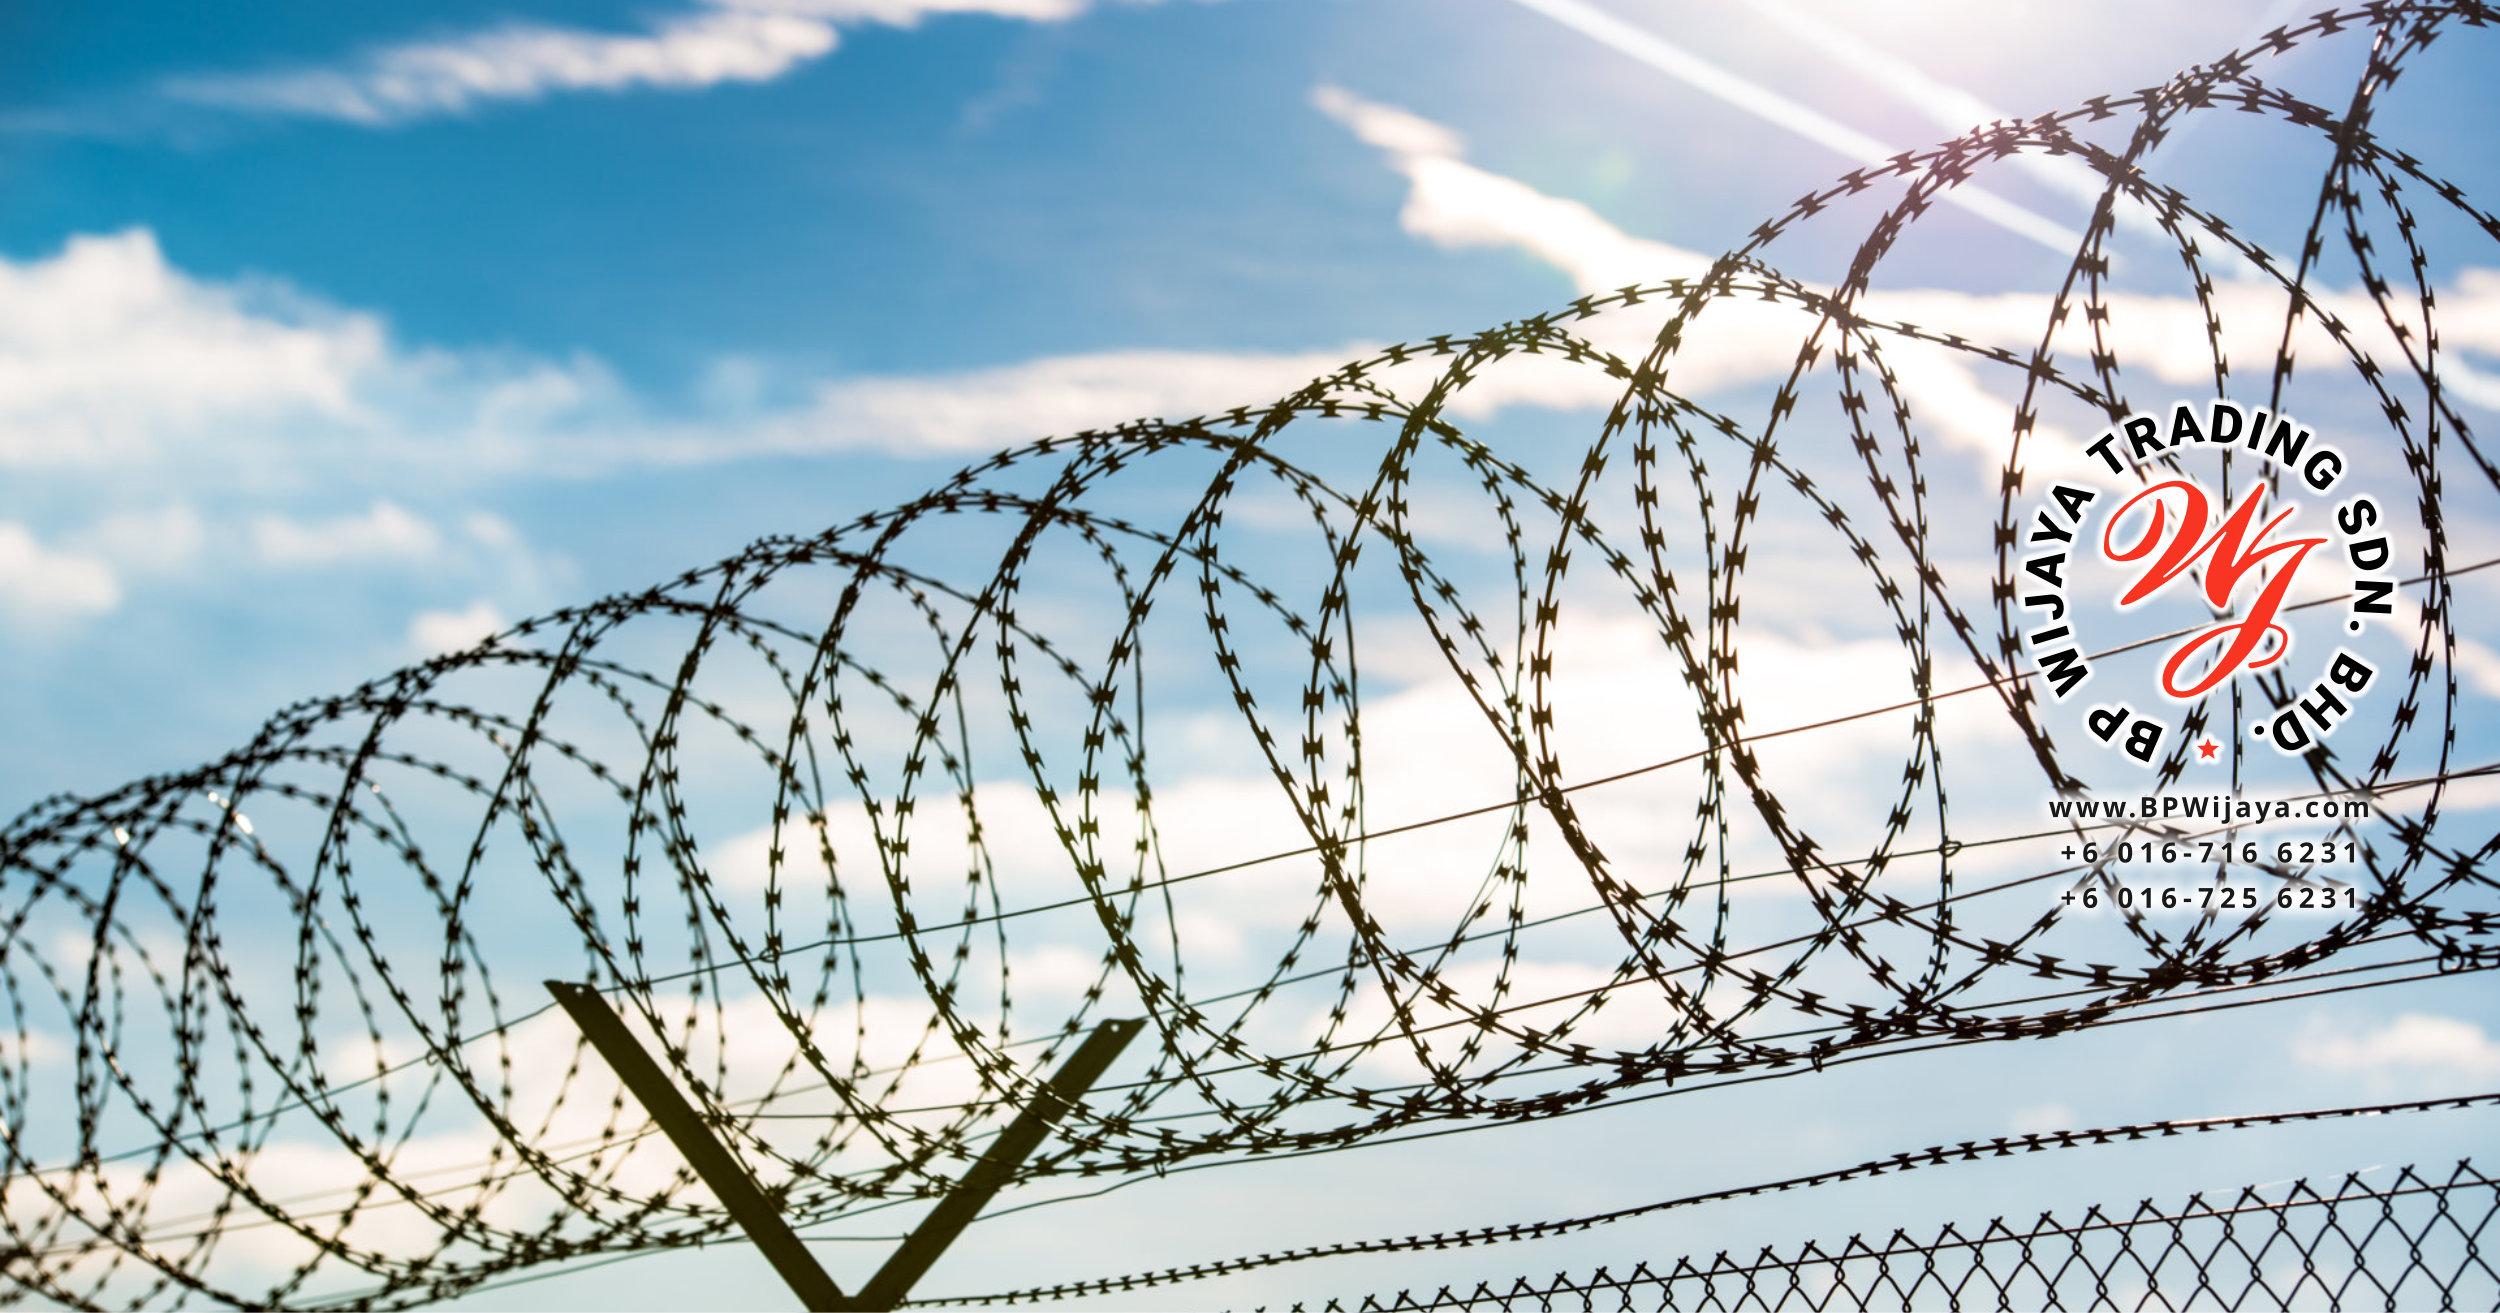 Galvanized Razor Barbed Wire – BP WIJAYA TRADING SDN BHD